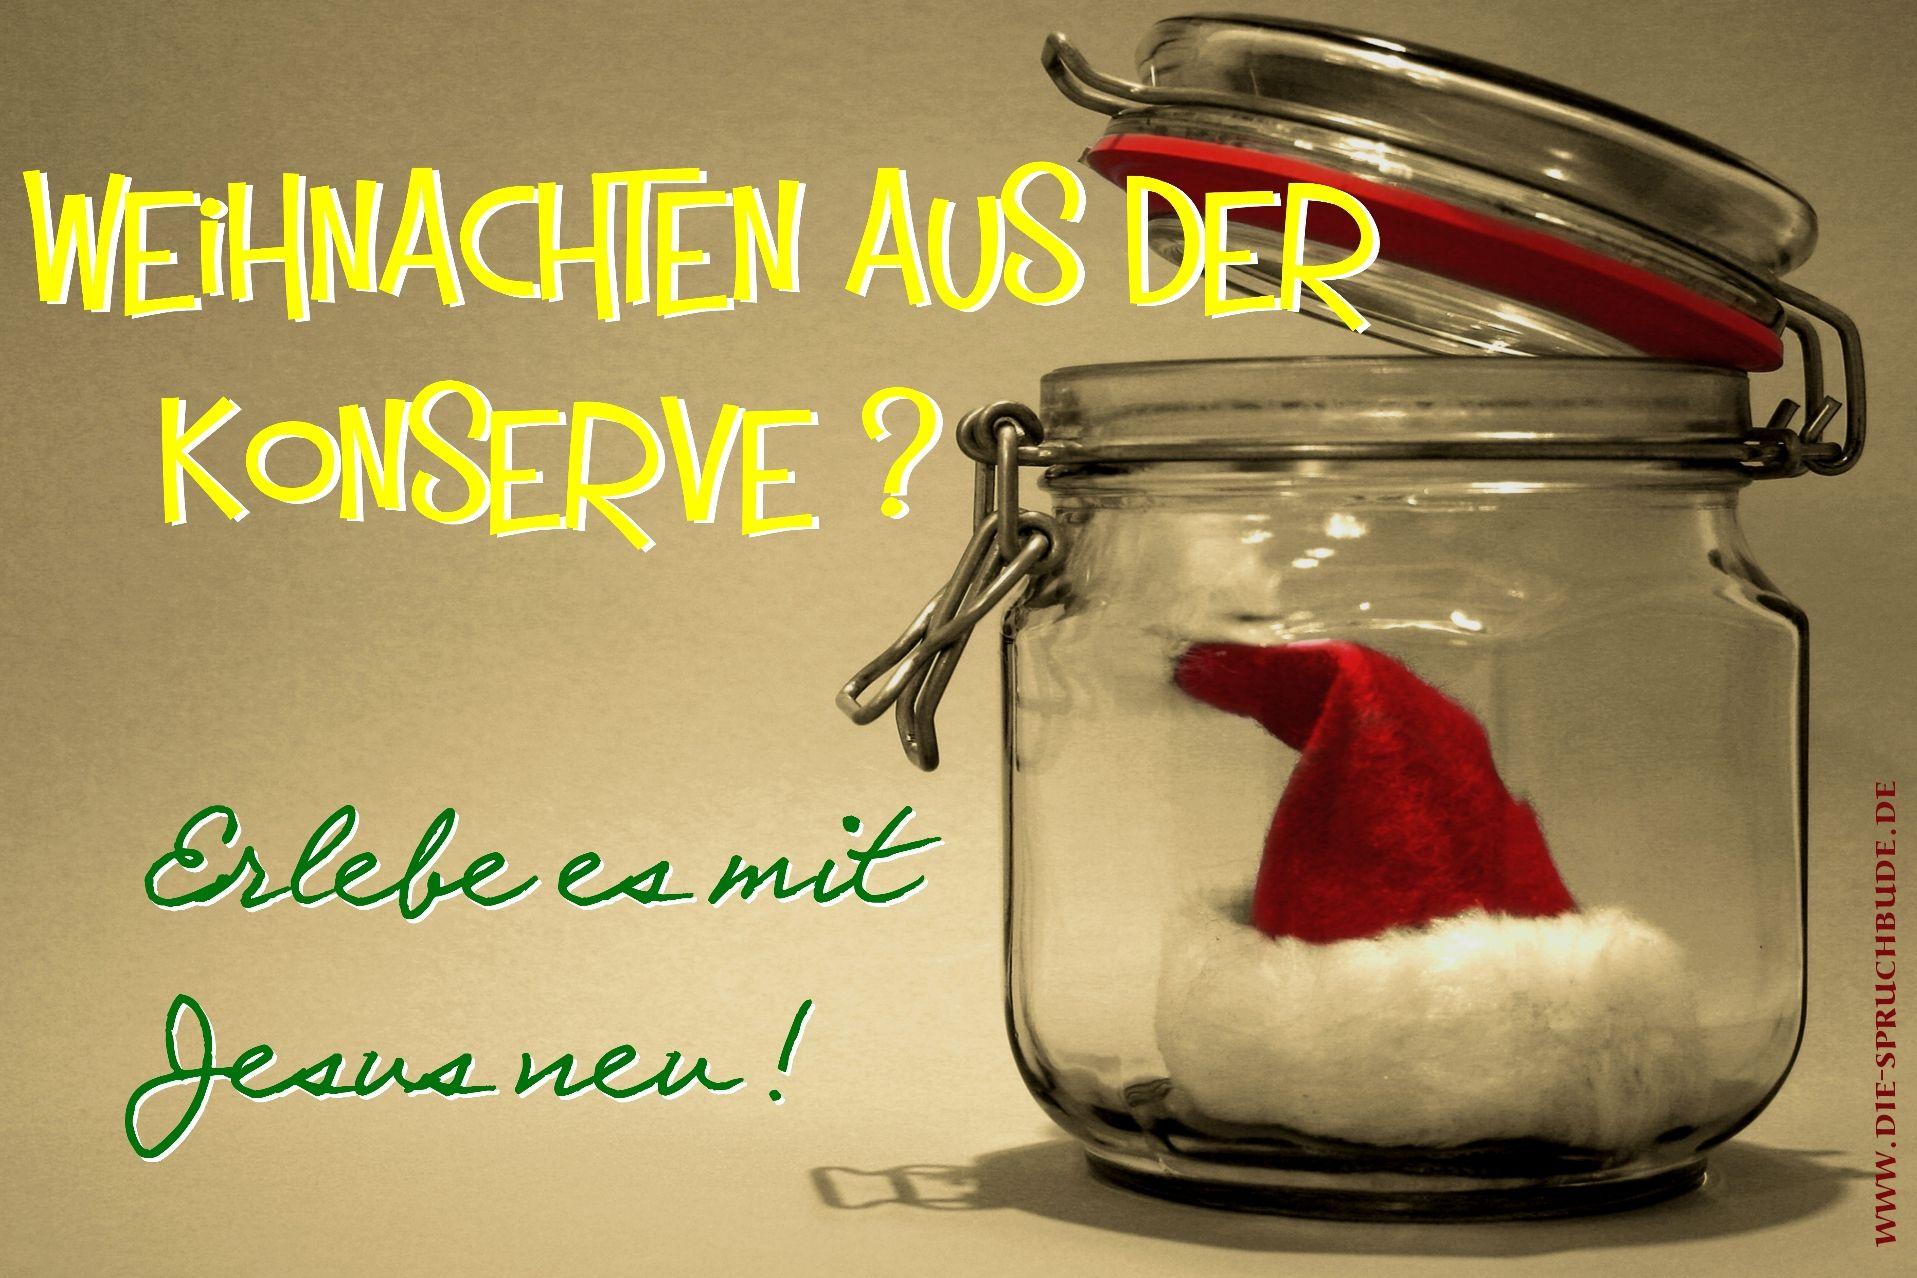 Konserve - Spruchkarte Weihnachten, e-card, Postkarte   © www.die-spruchbude.de / Foto: Jenzig71 - photocase.com